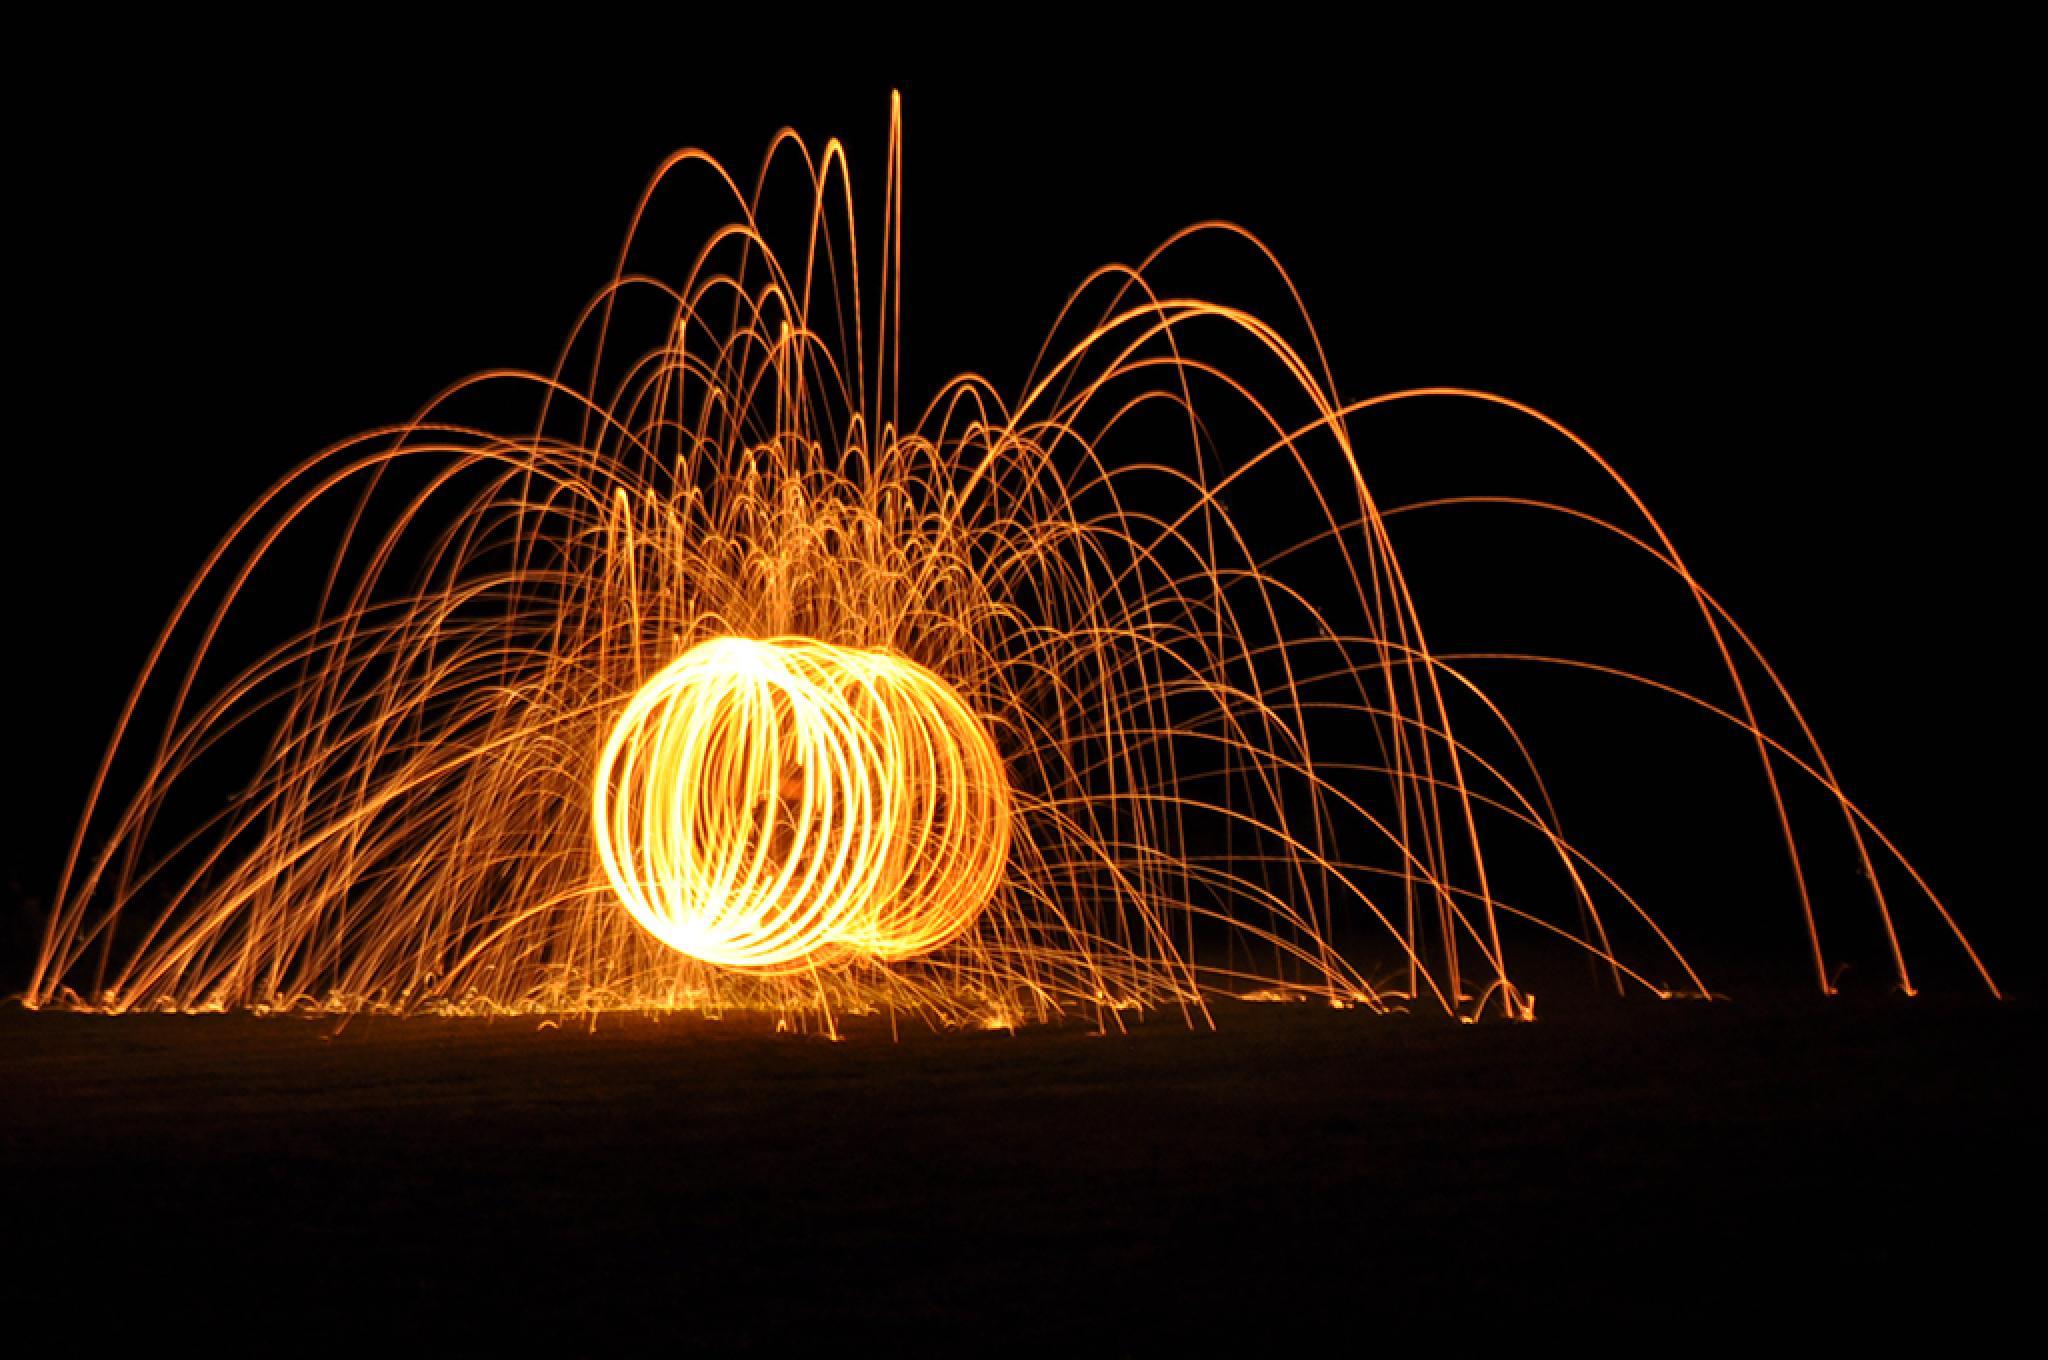 Fireball by KevinMorganDesigns